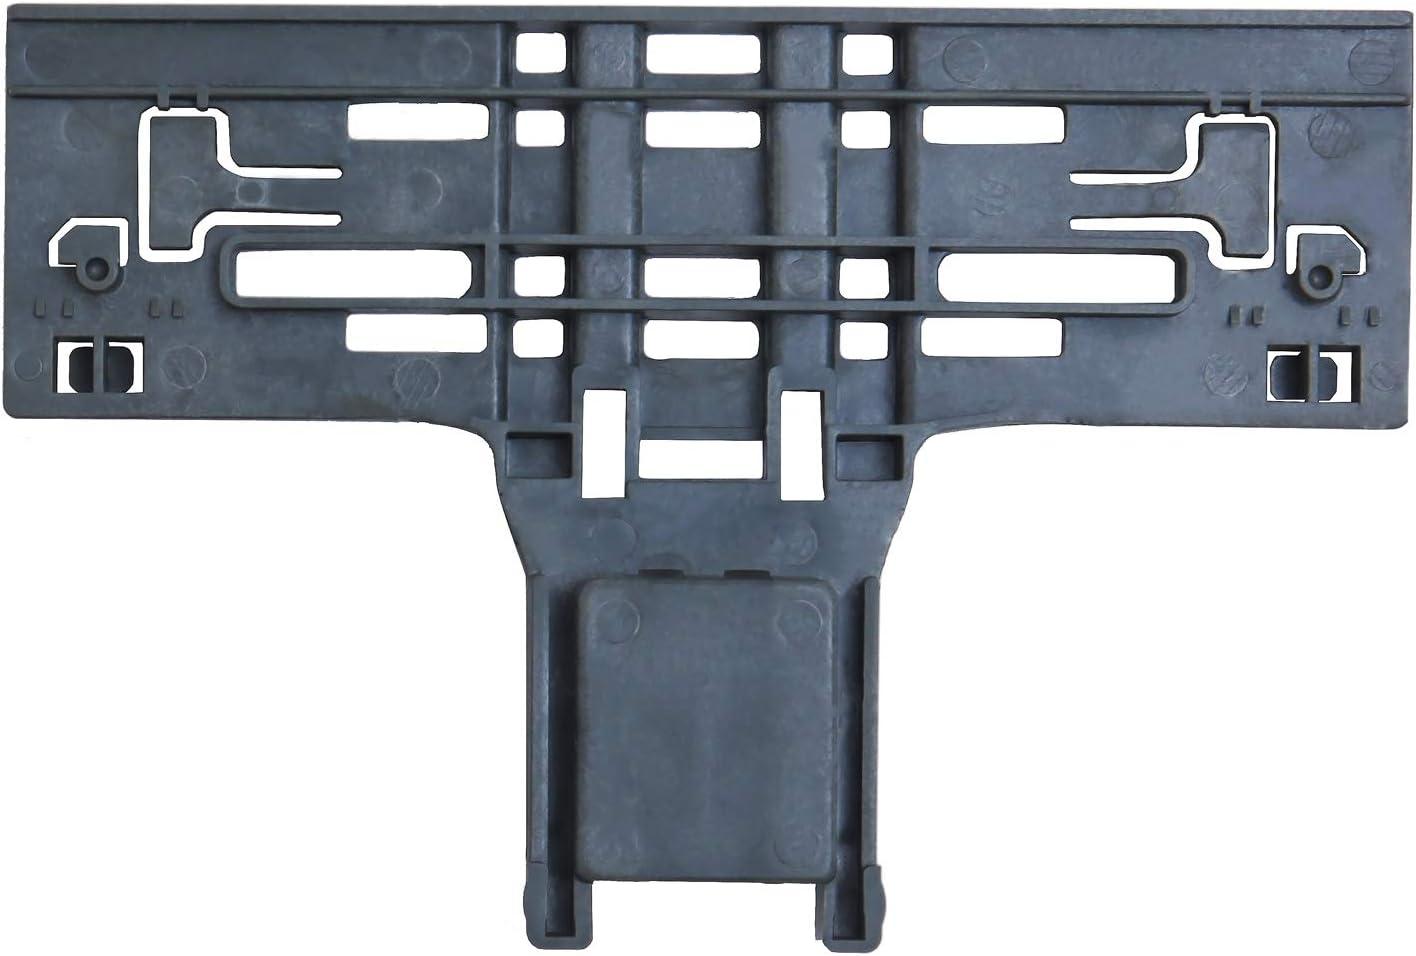 Cykemo W10546503 Dishwasher Top Rack Adjuster for Whirlpool KitchenAid Dishwasher Parts Replaces W10418314